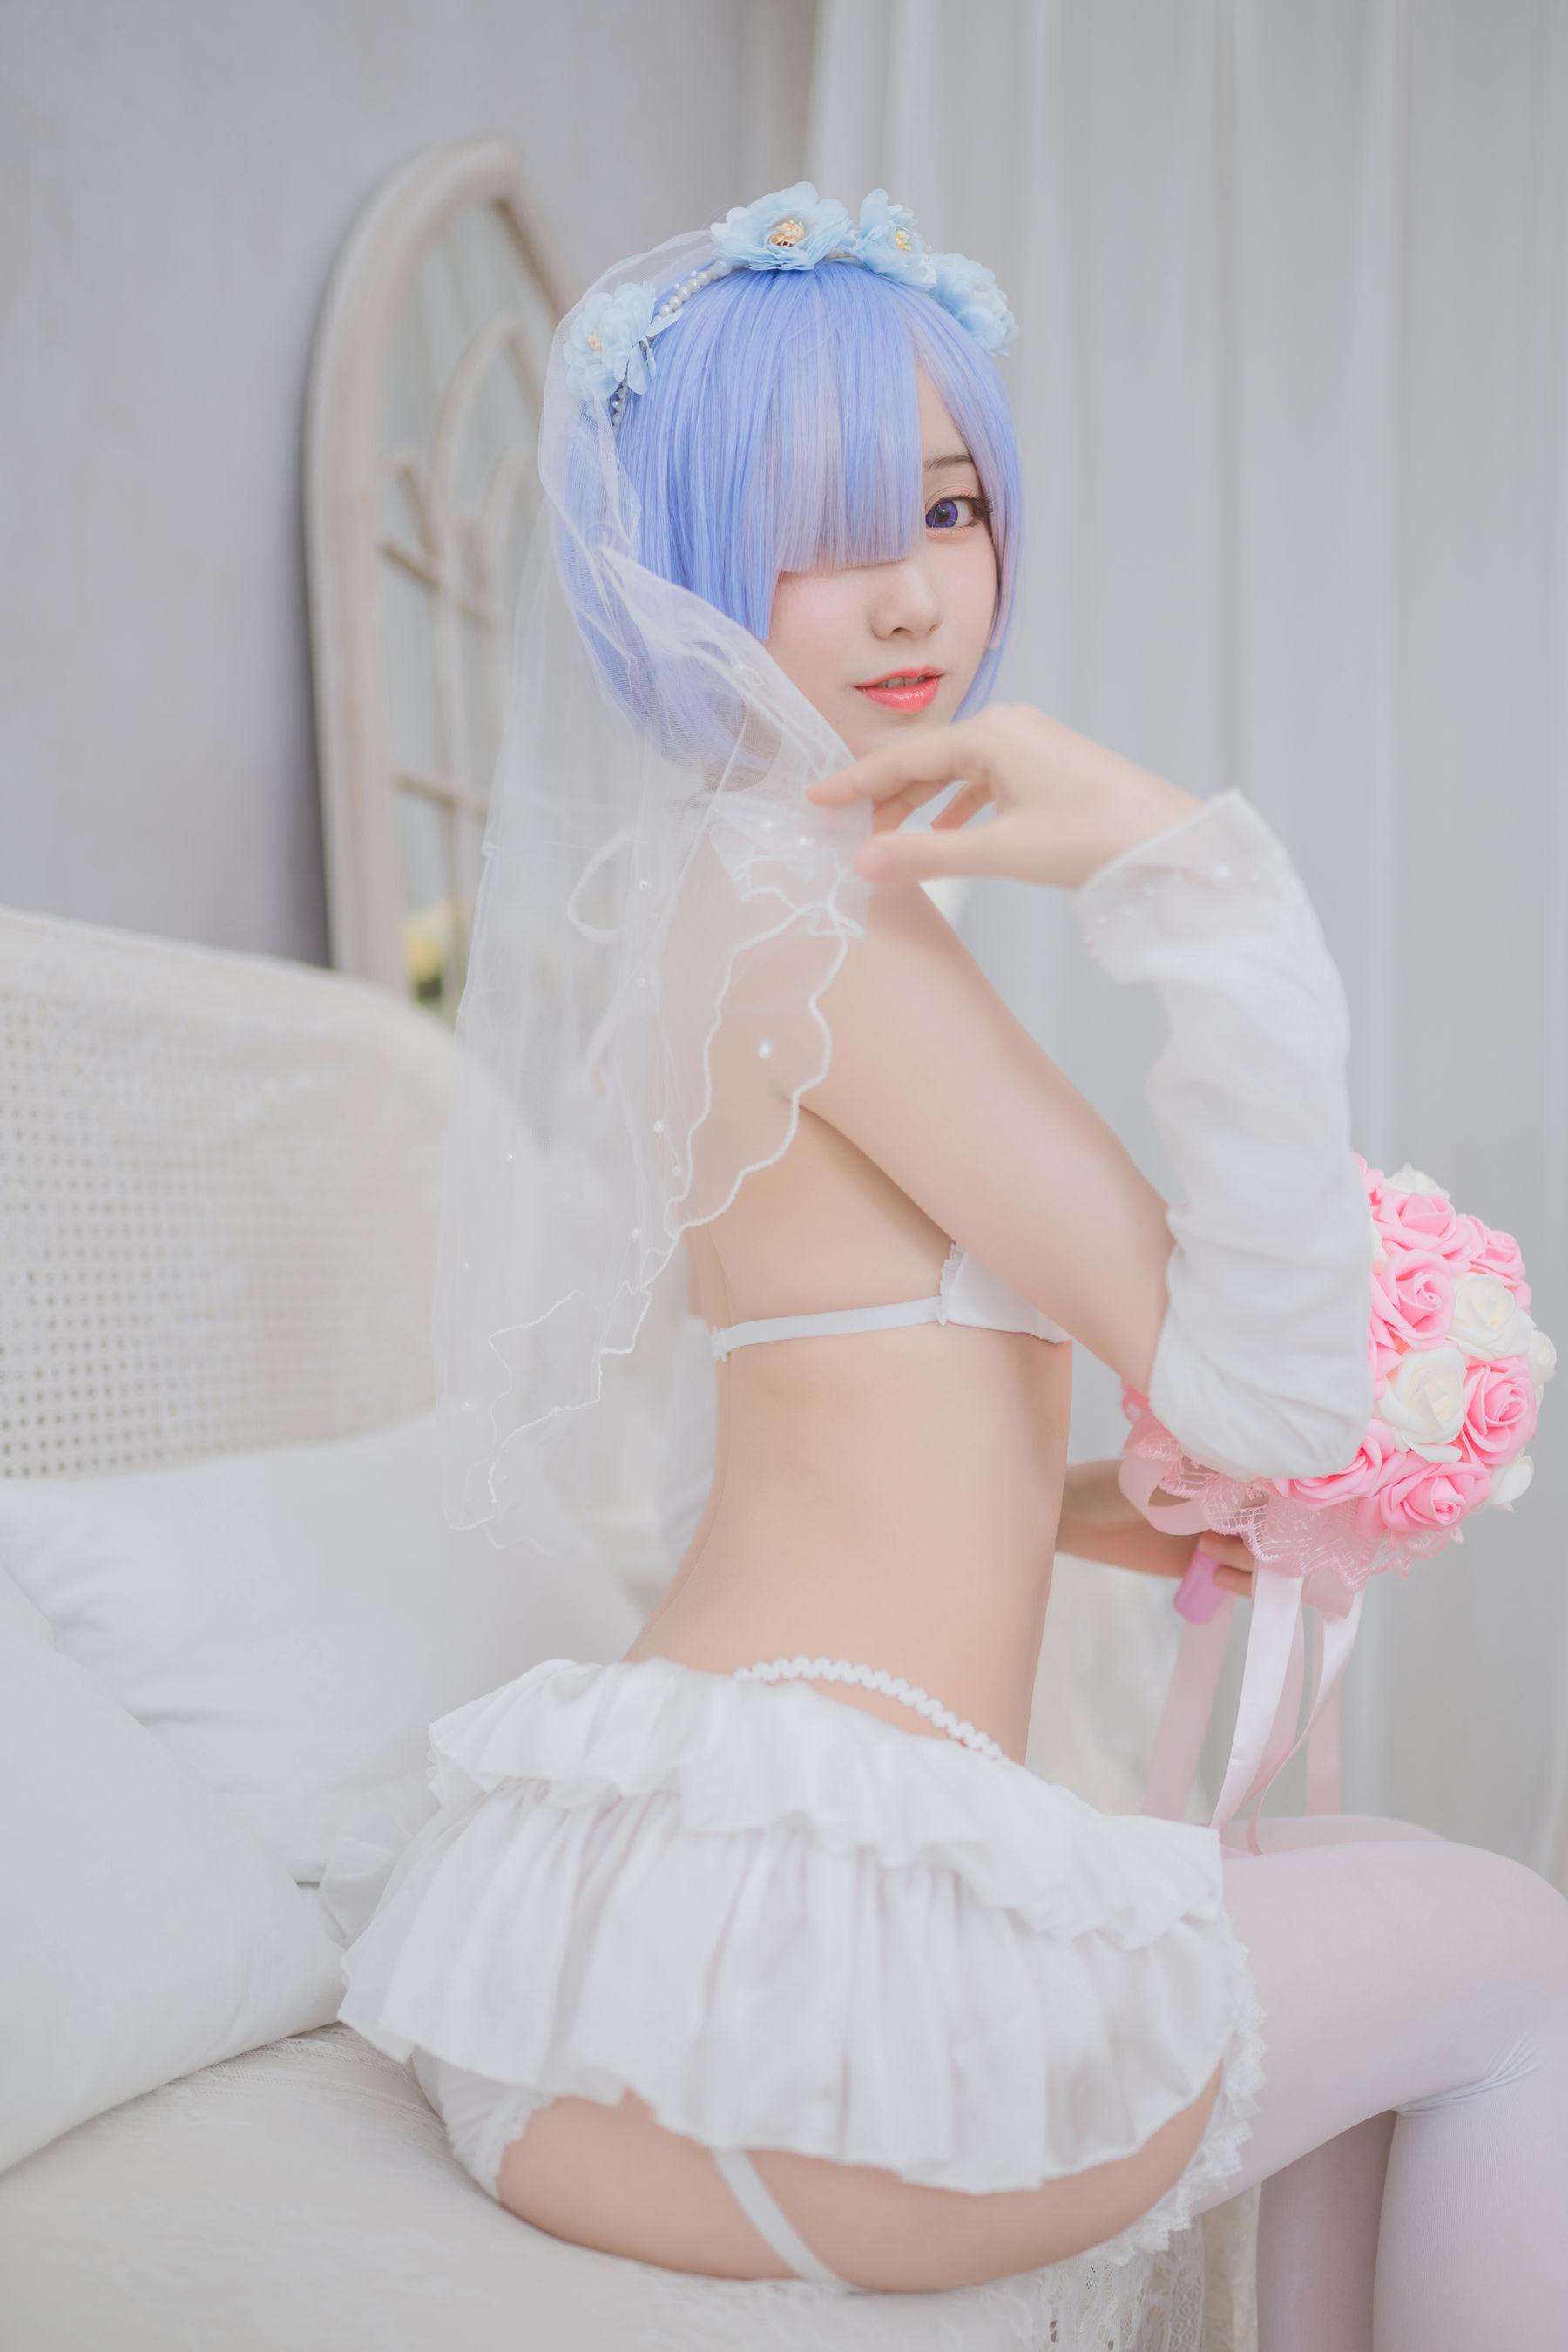 VOL.1430 [网络美女]婚纱:木绵绵超高清写真套图(30P)